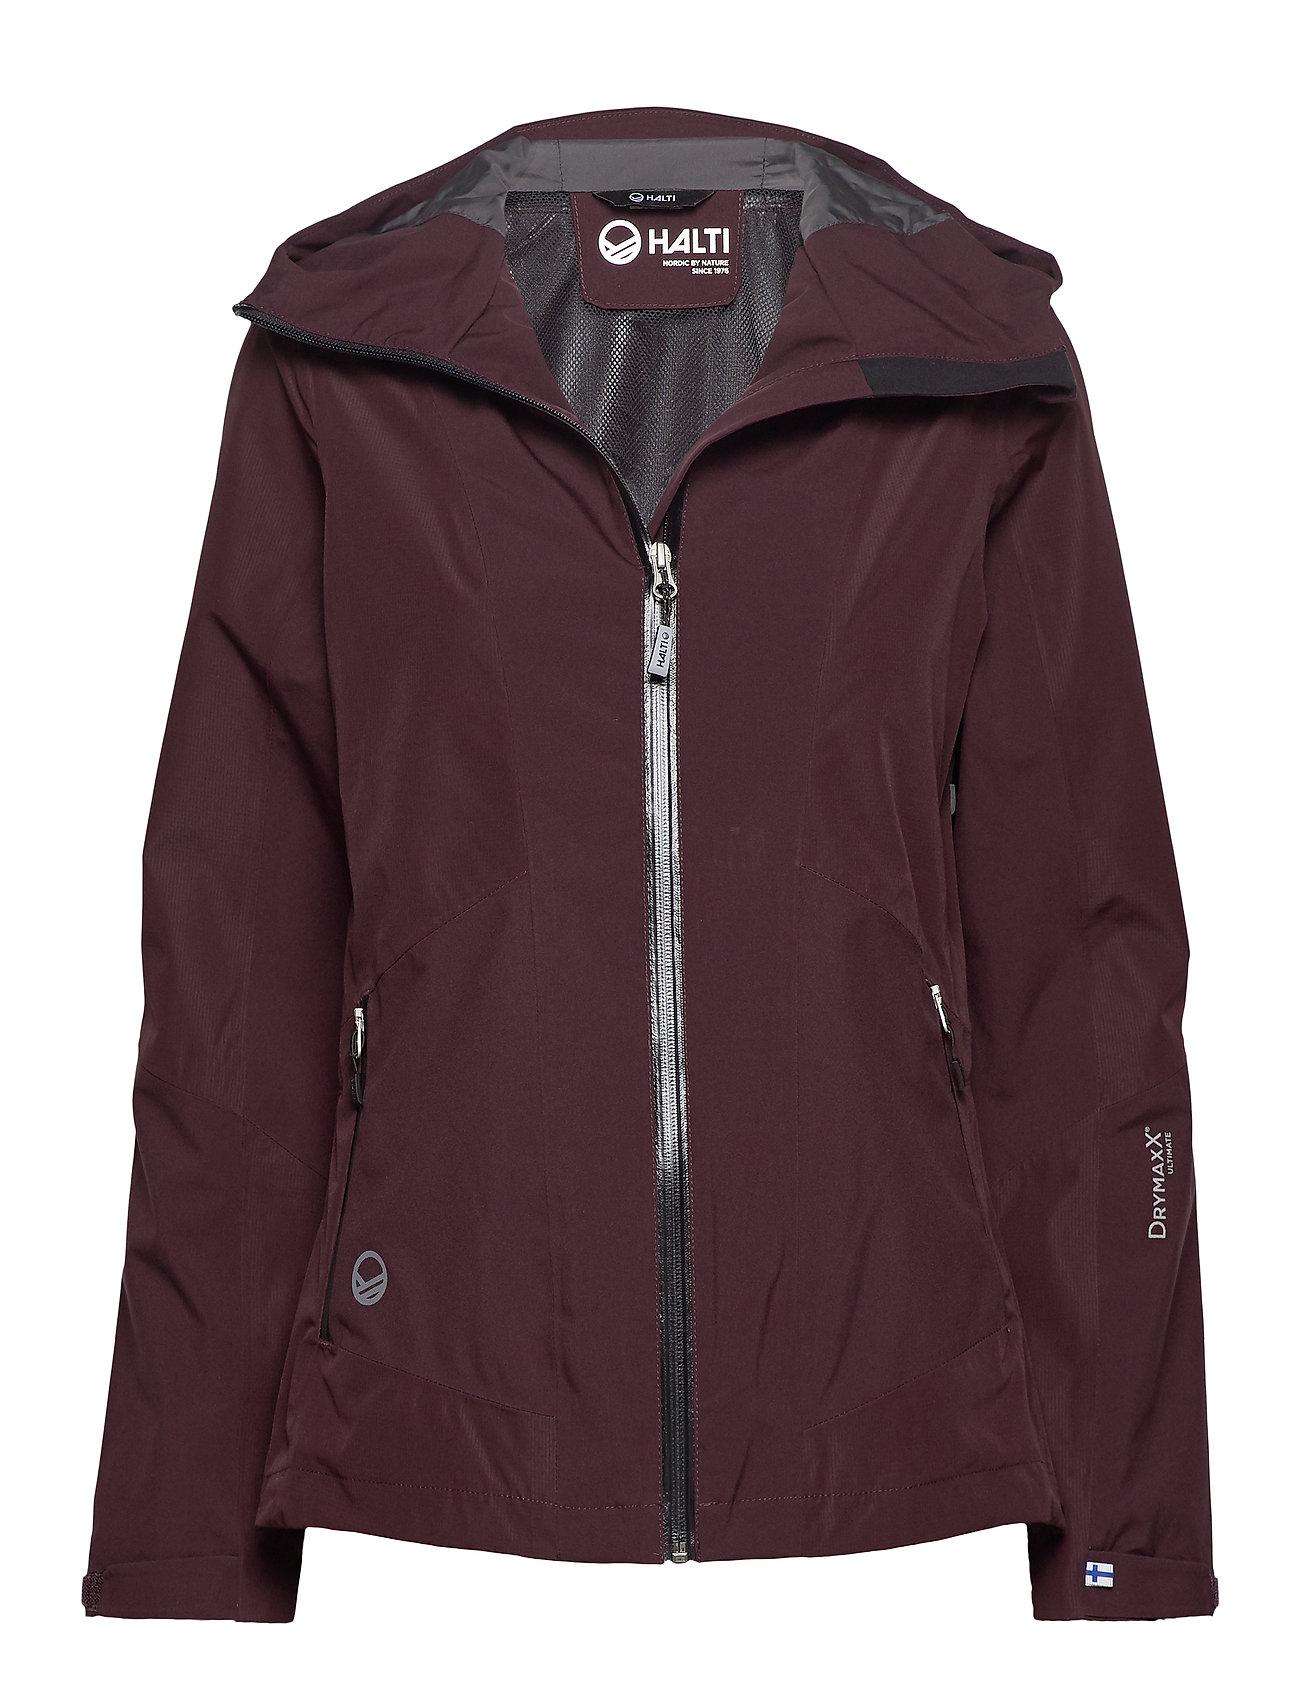 Vaara W Jacket Outerwear Sport Jackets Punainen Halti